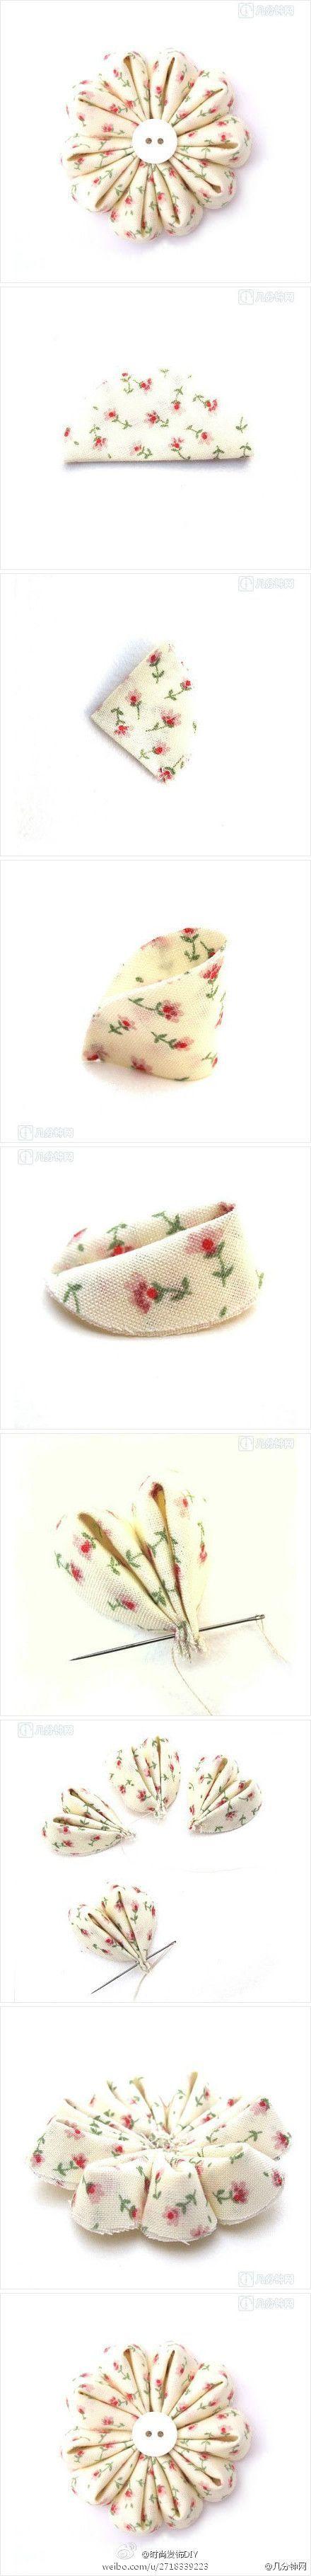 DIY fabric flower:                                                       …